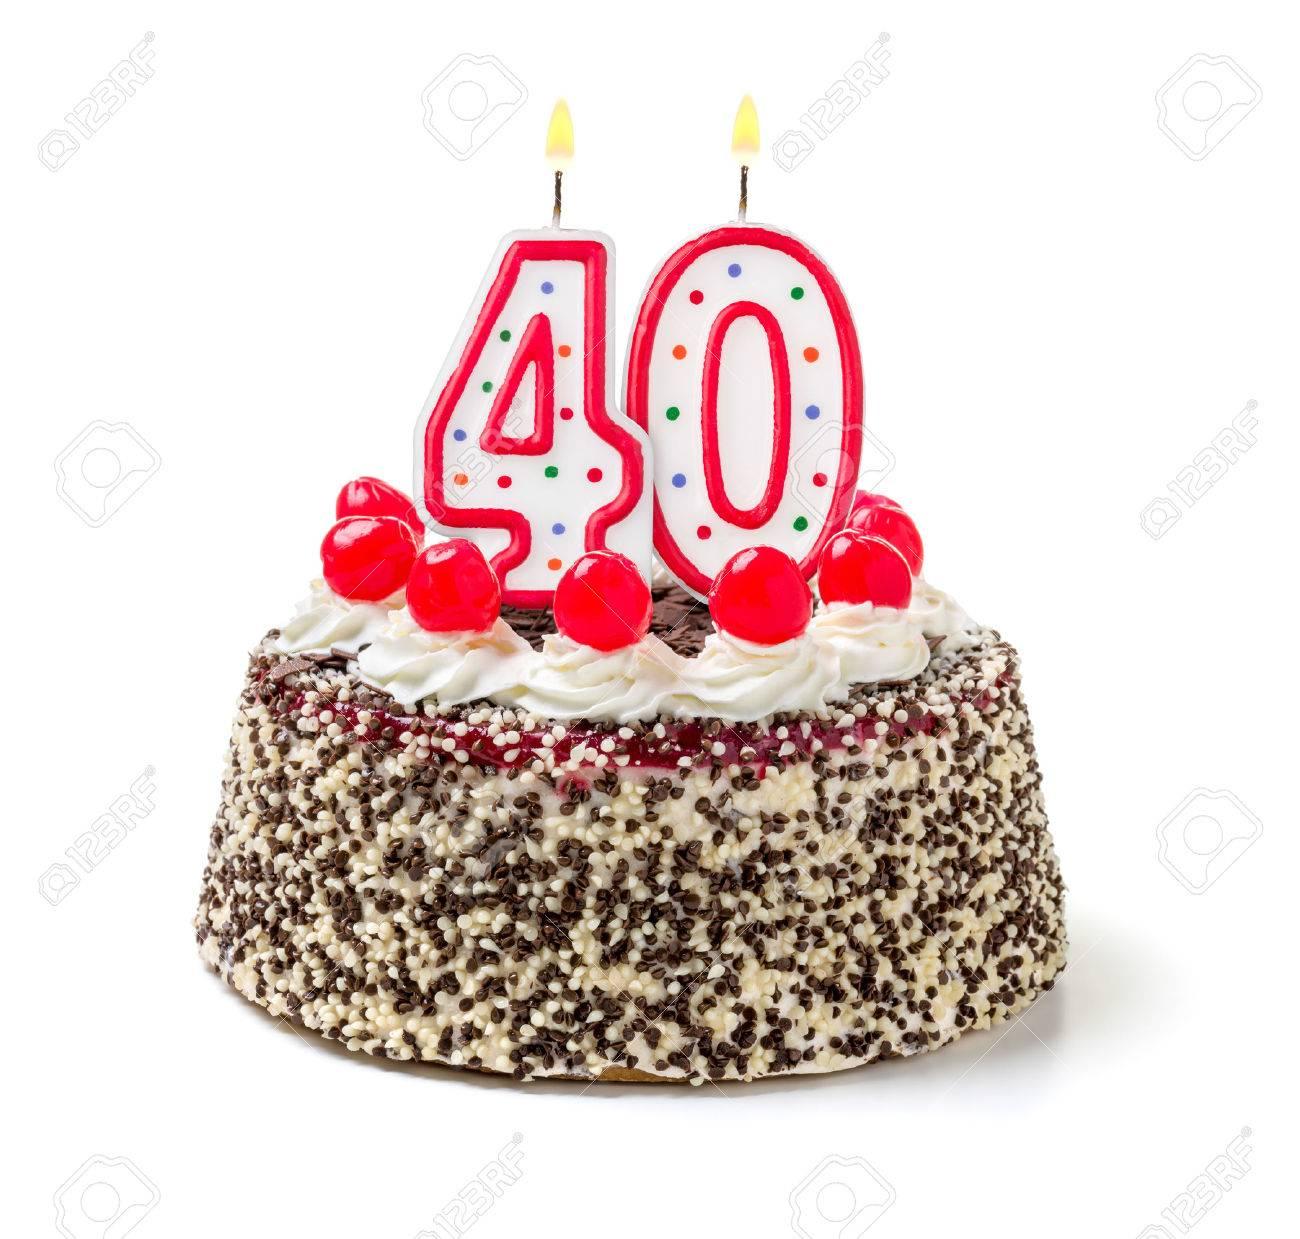 Birthday Cake With Burning Candle Number 40 Stock Photo